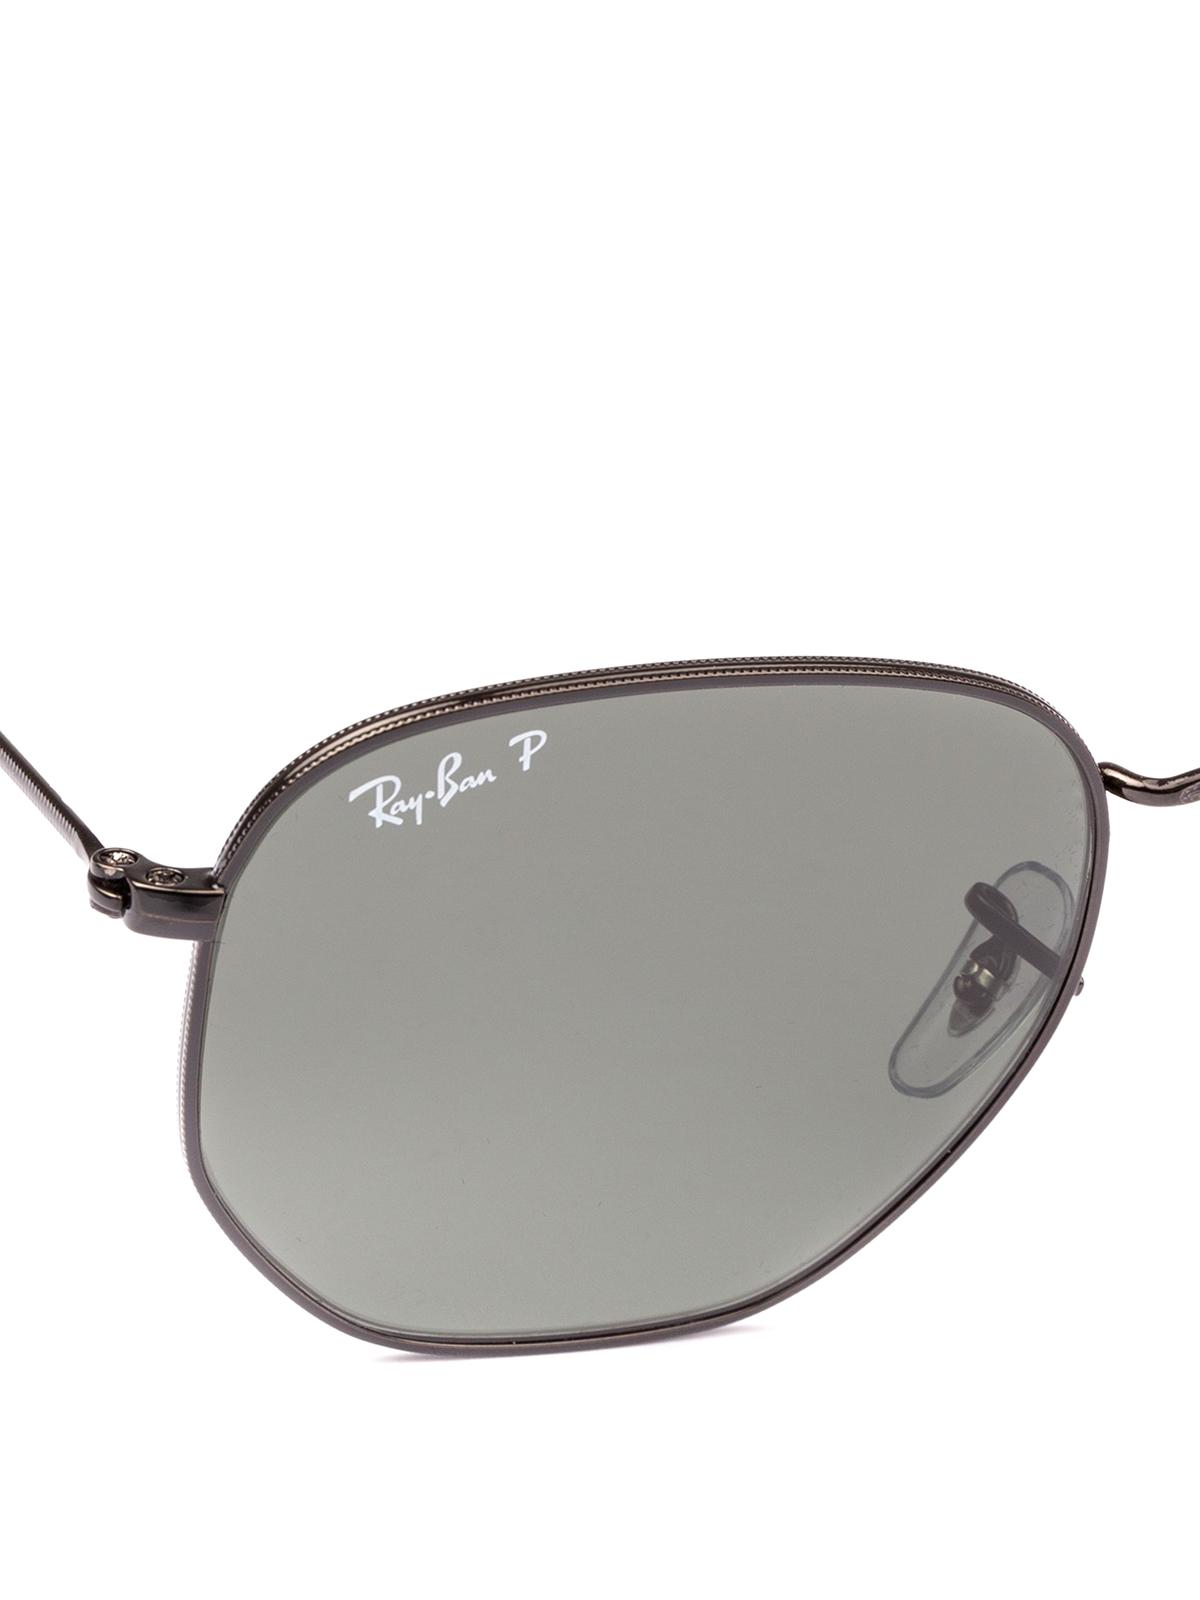 b51e441d8f6db iKRIX RAY-BAN  sunglasses - Hexagonal frame dark lenses sunglasses